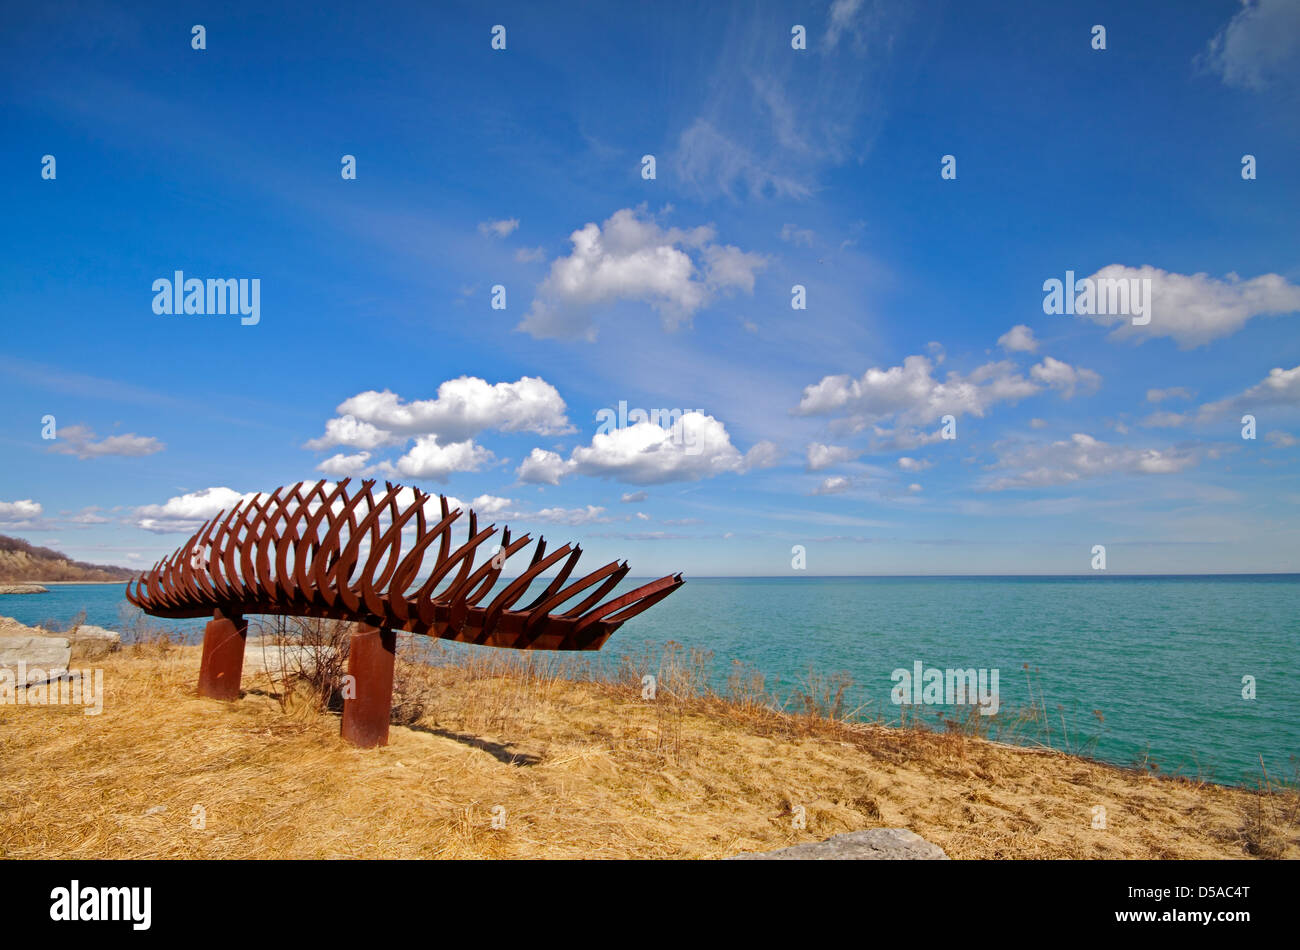 Passage Sculpture at Scarborough Bluffs - Stock Image